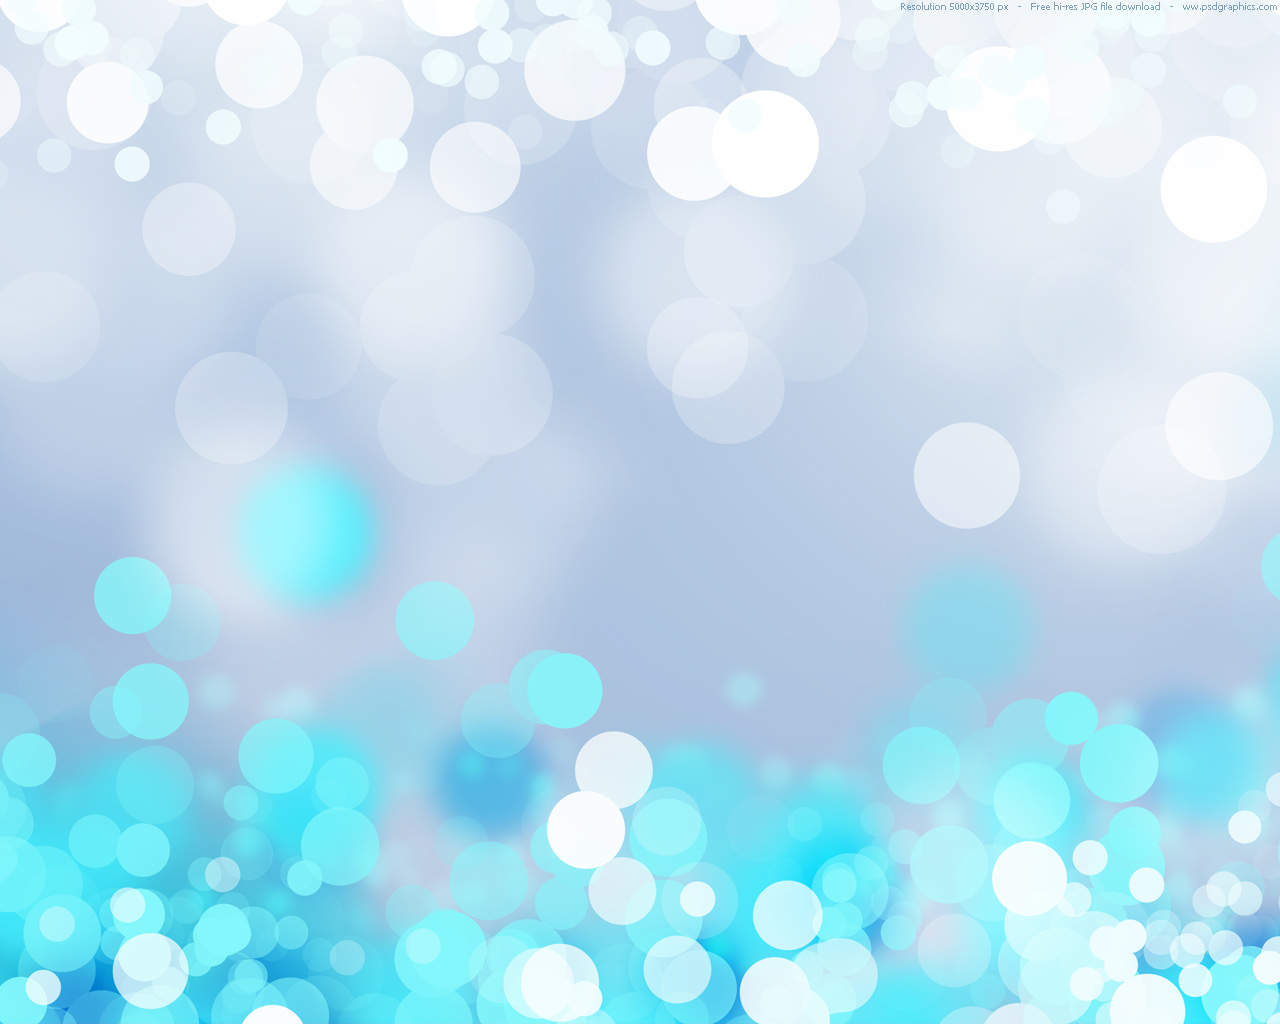 blurry-lights-background